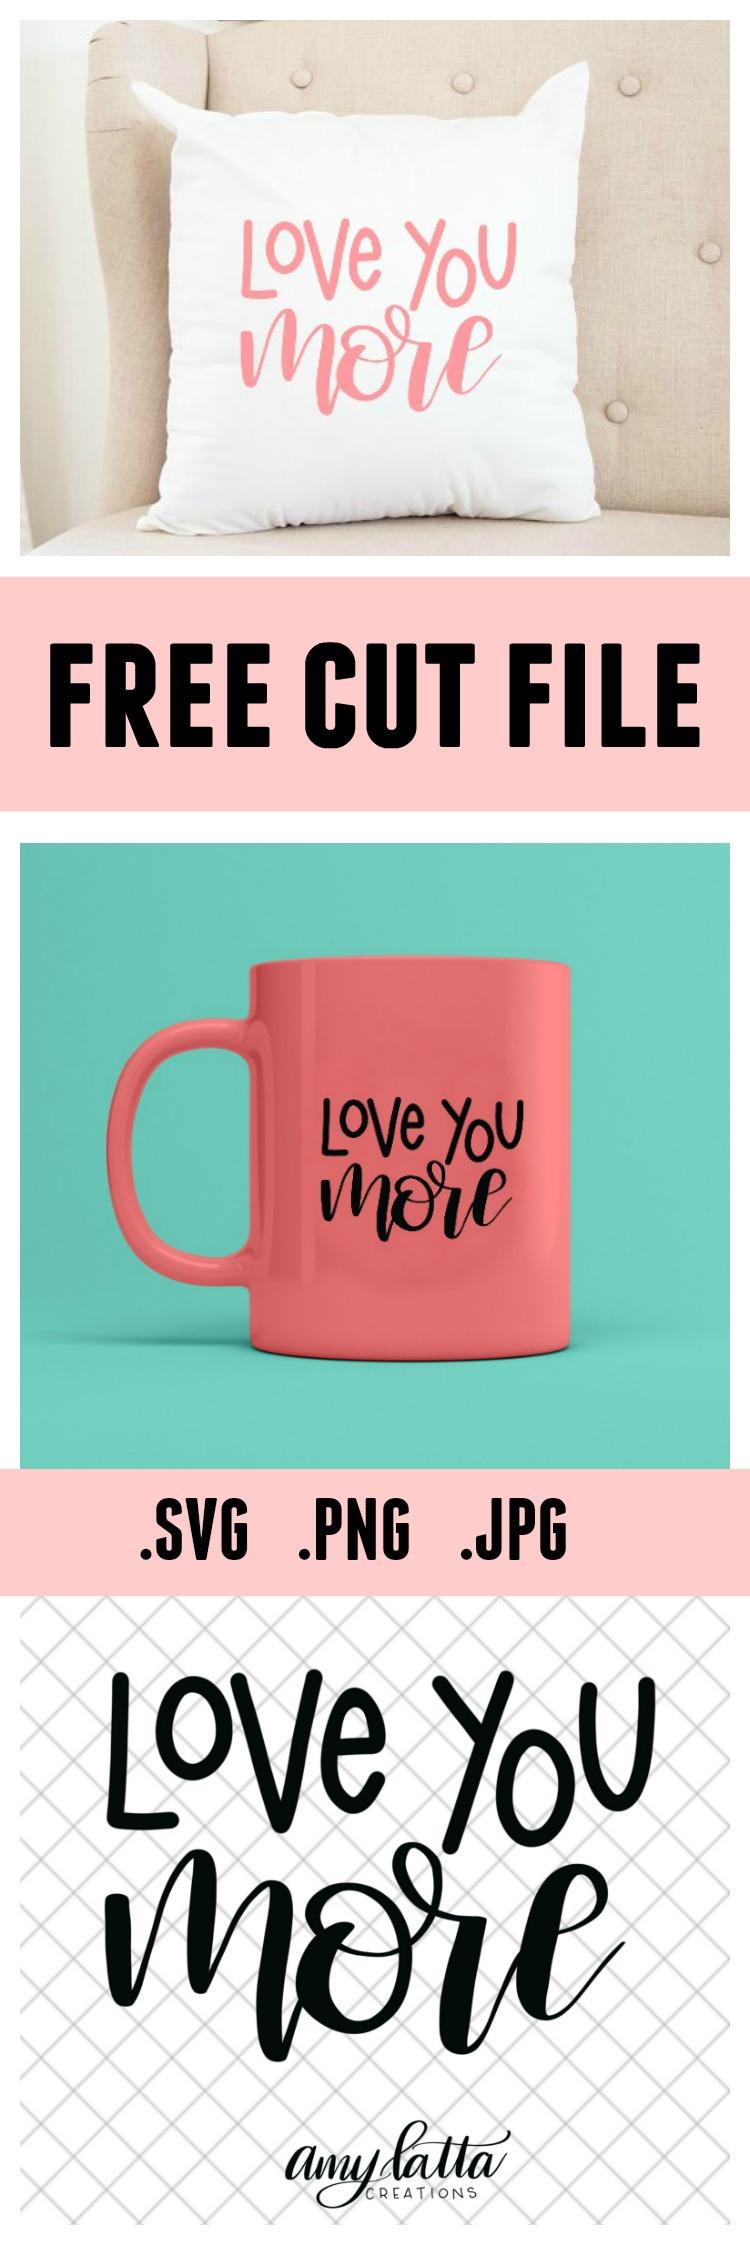 Love You More Free Cut File